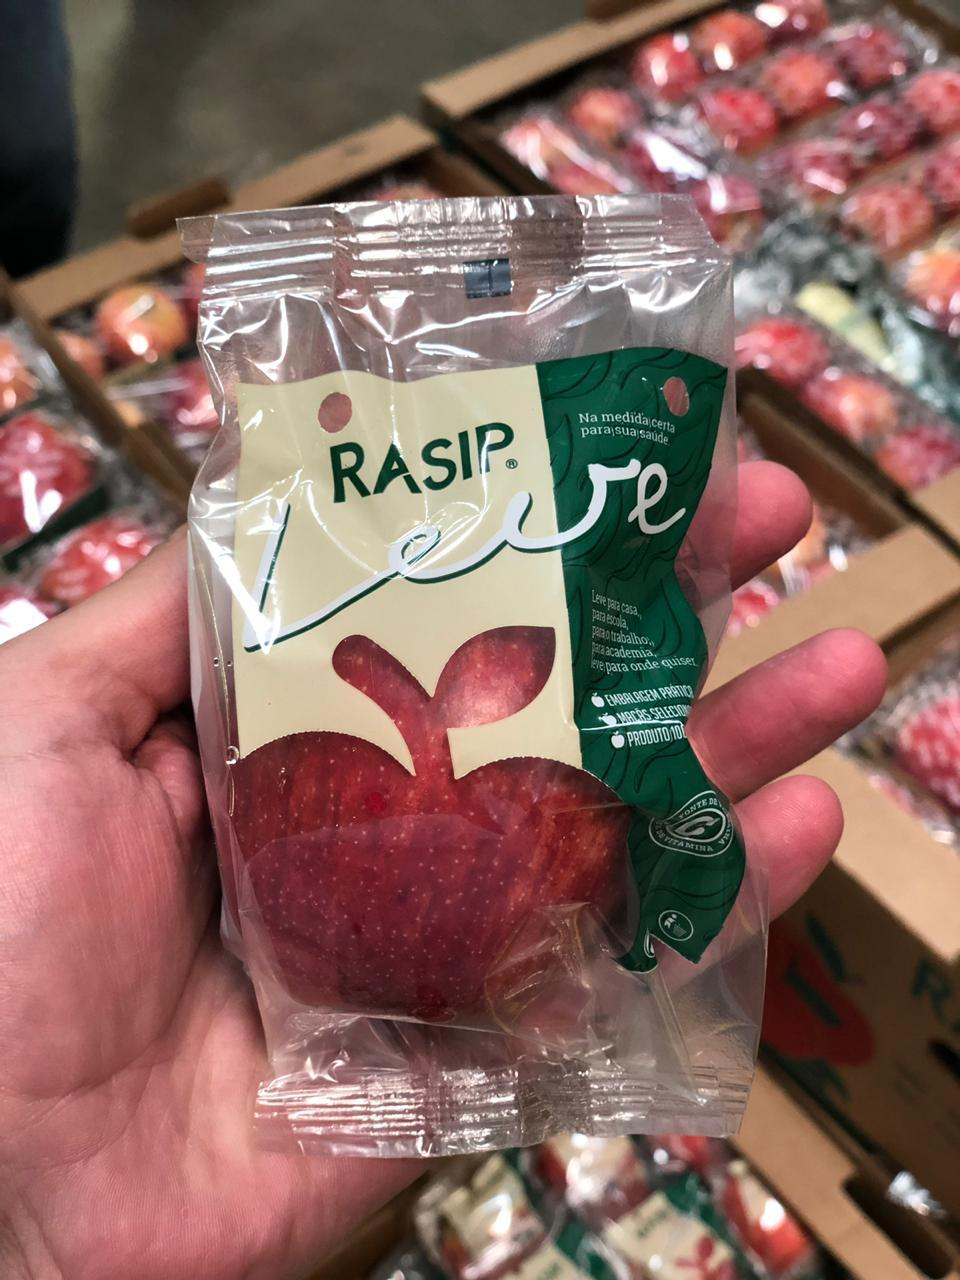 Rasip2